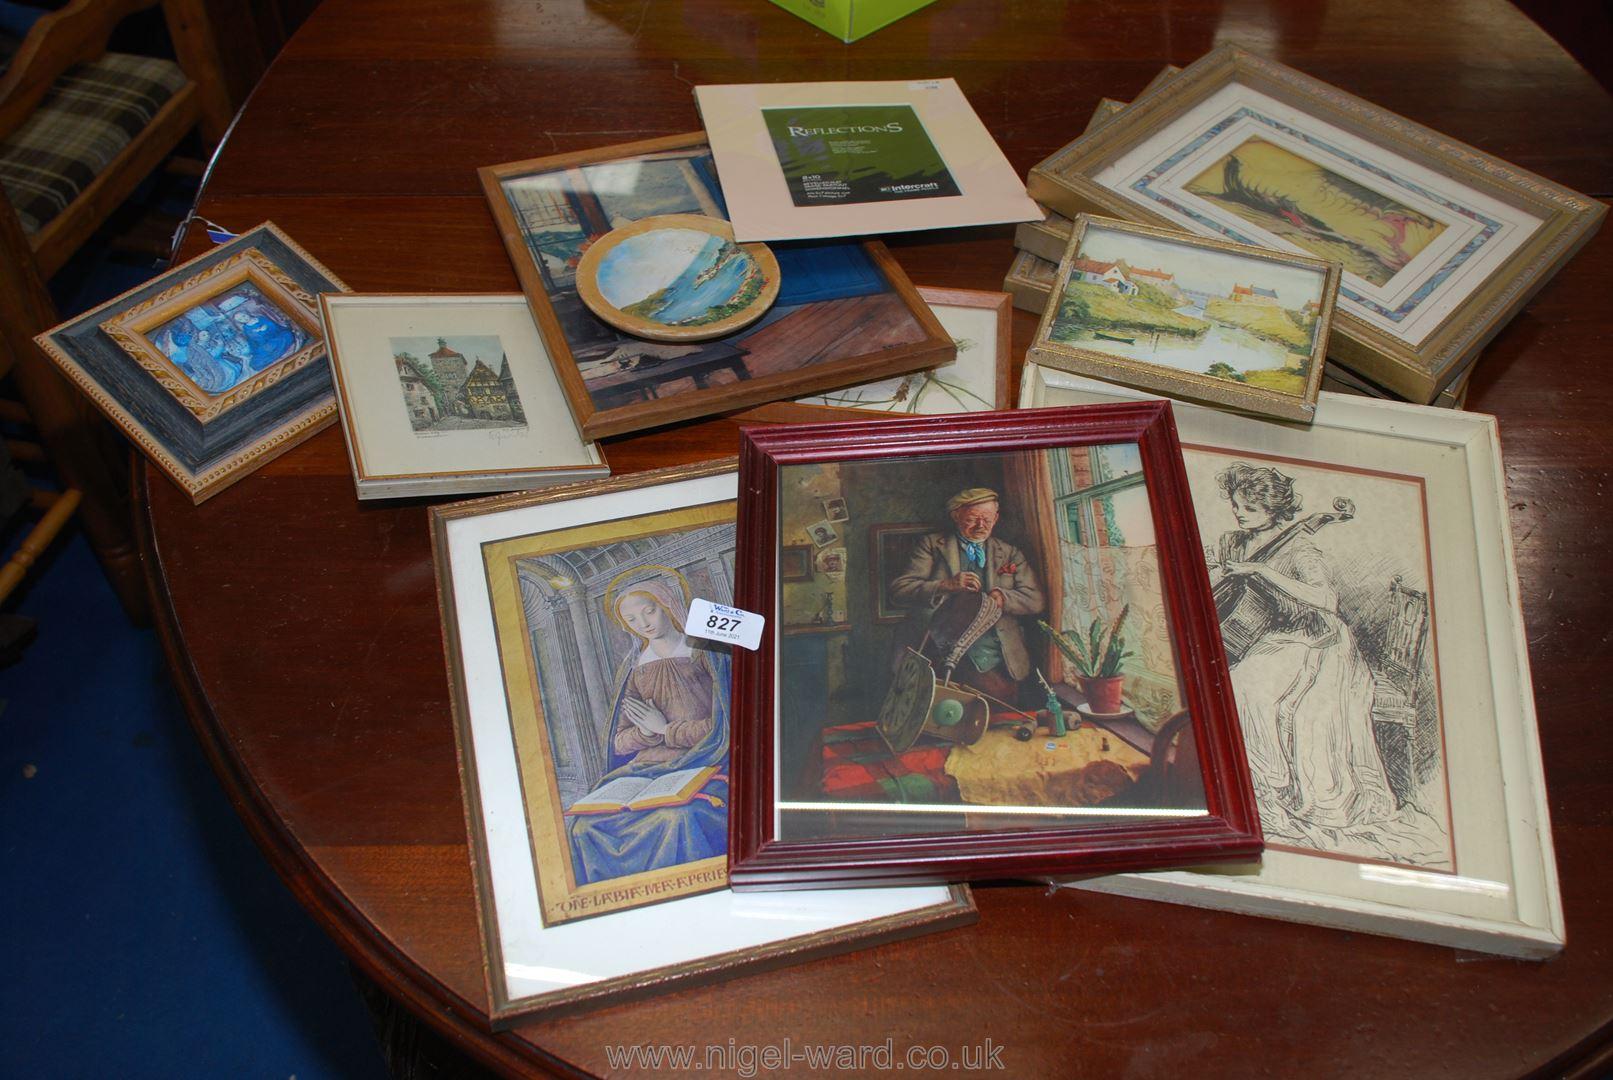 A quantity of various prints etc.